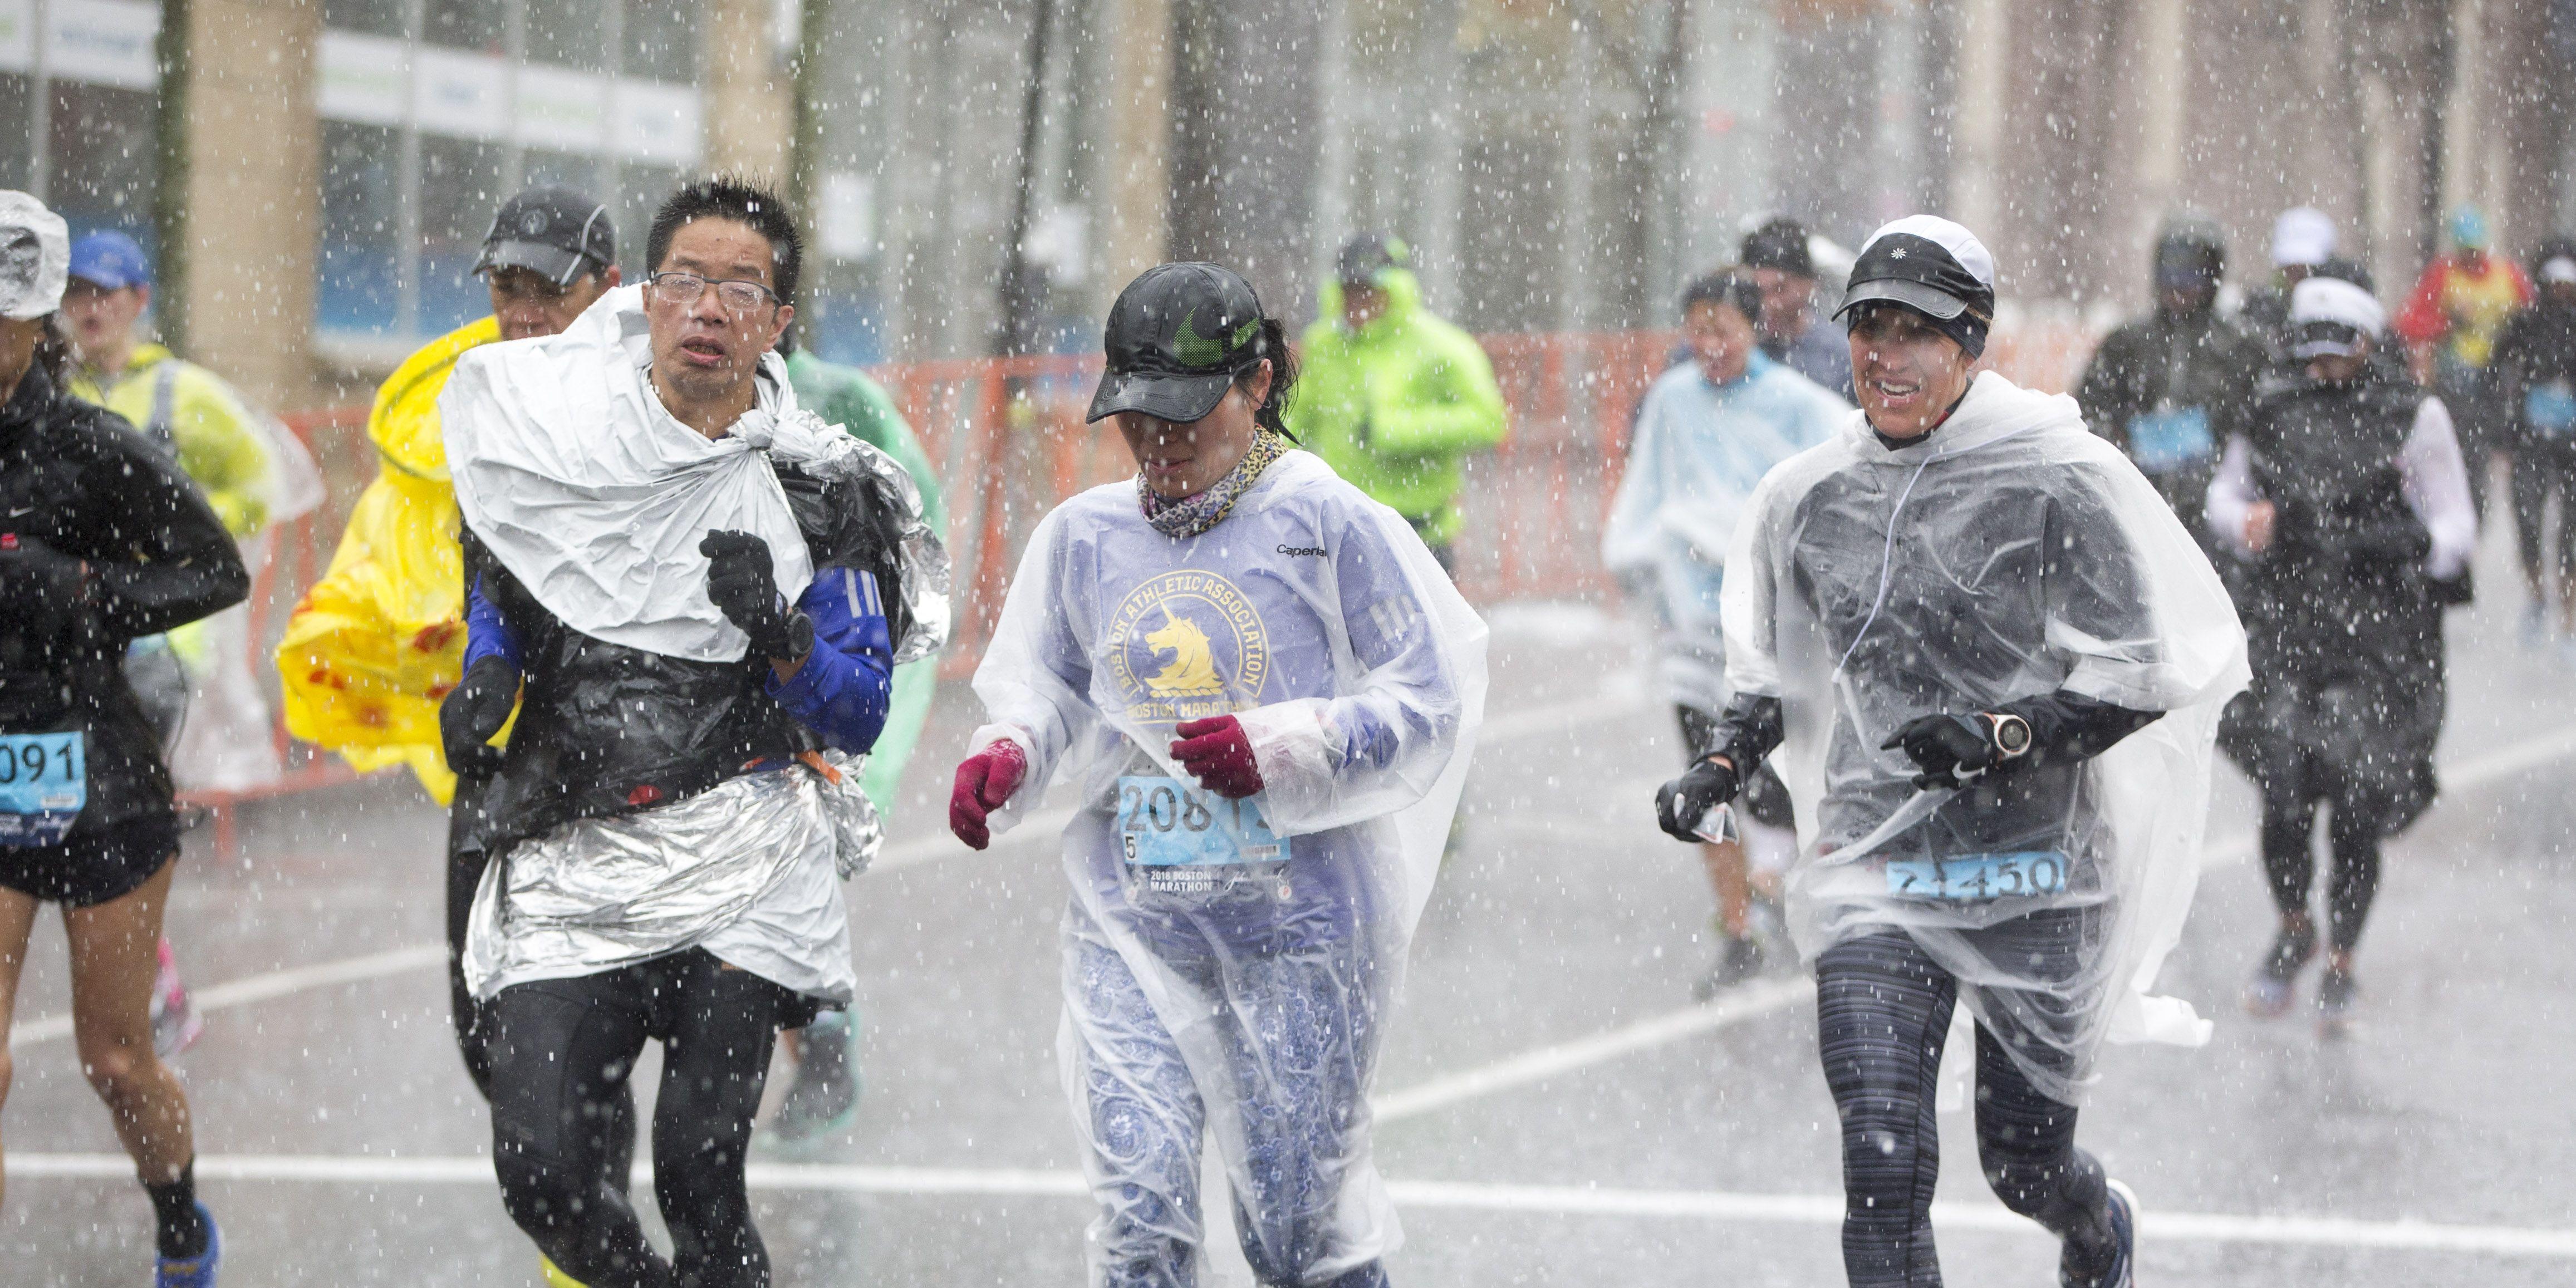 Runners Compete In The 2018 Boston Marathon